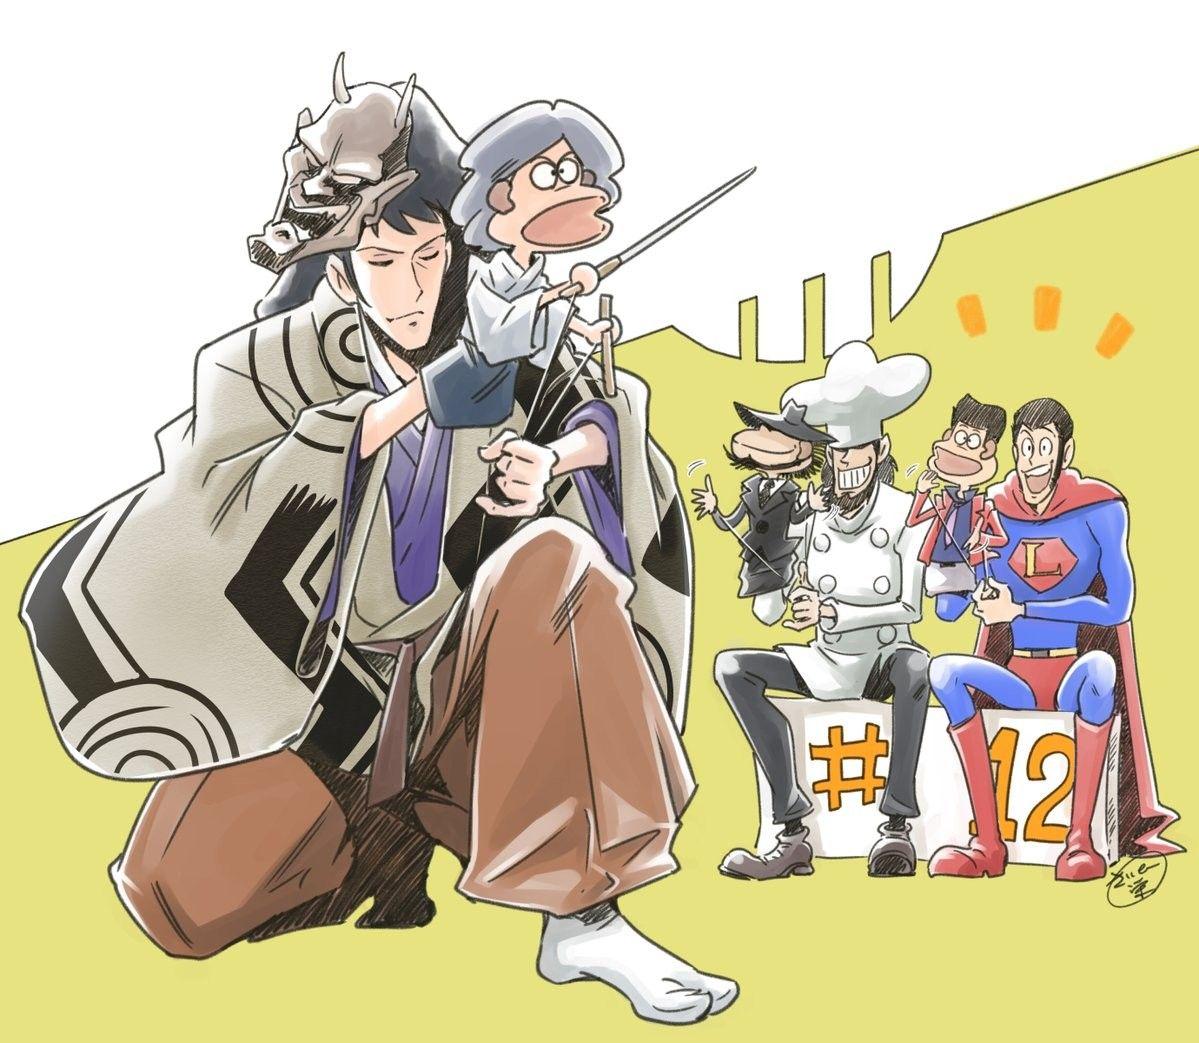 Digeio On Twitter Lu Iii Anime Favorite Character